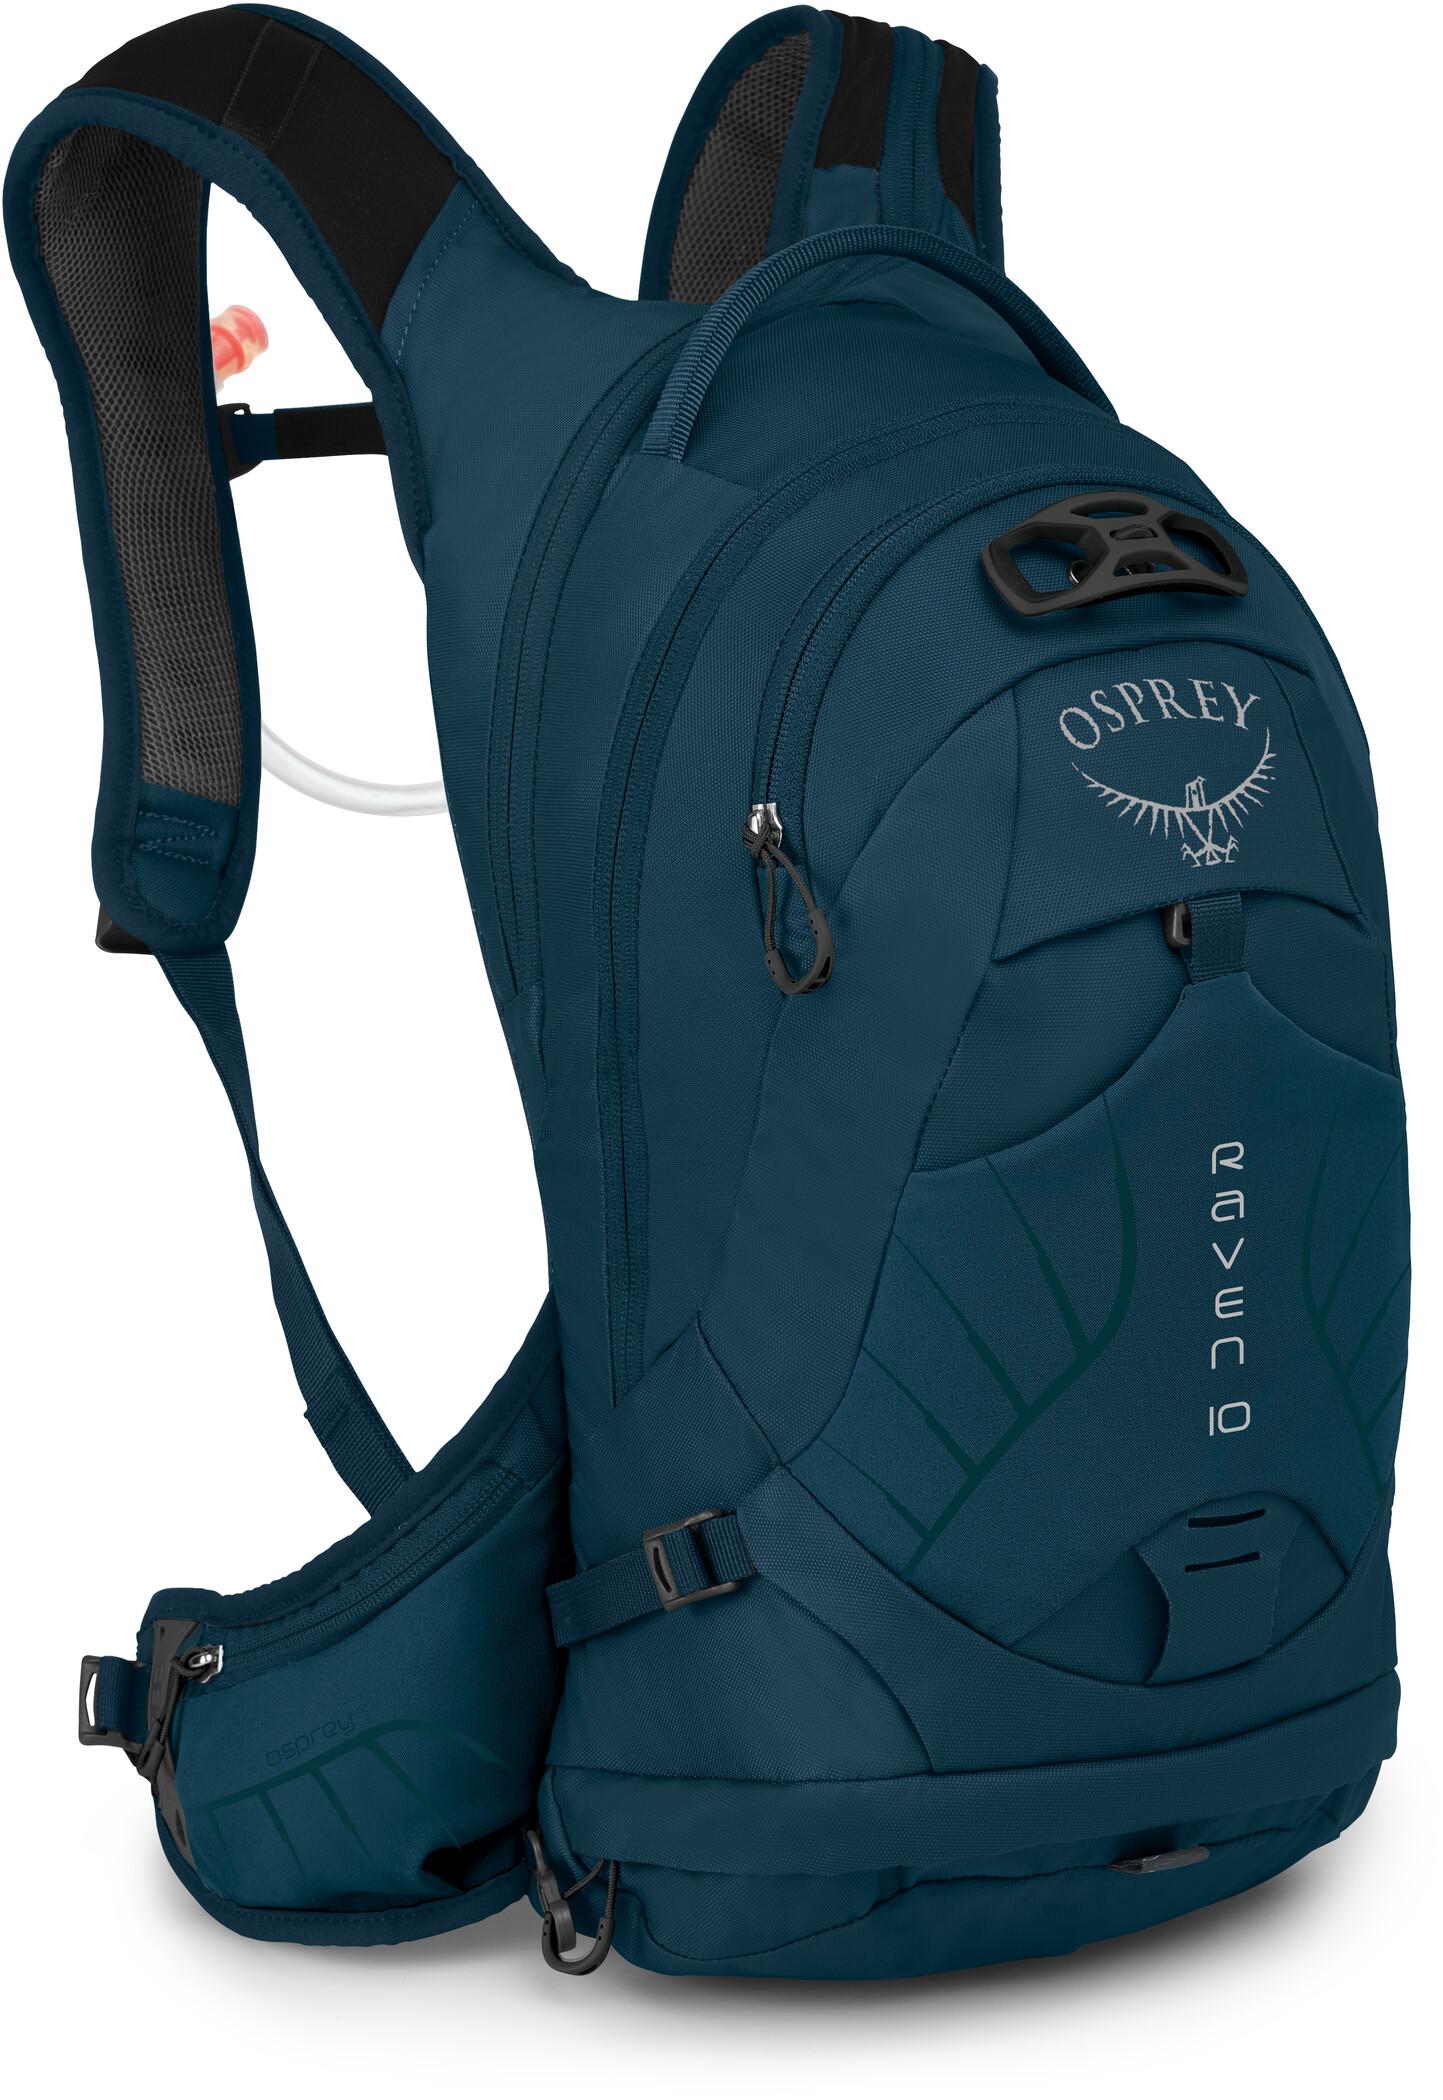 Osprey Raven 10 Rygsæk Damer, blue emerald (2019) | Travel bags